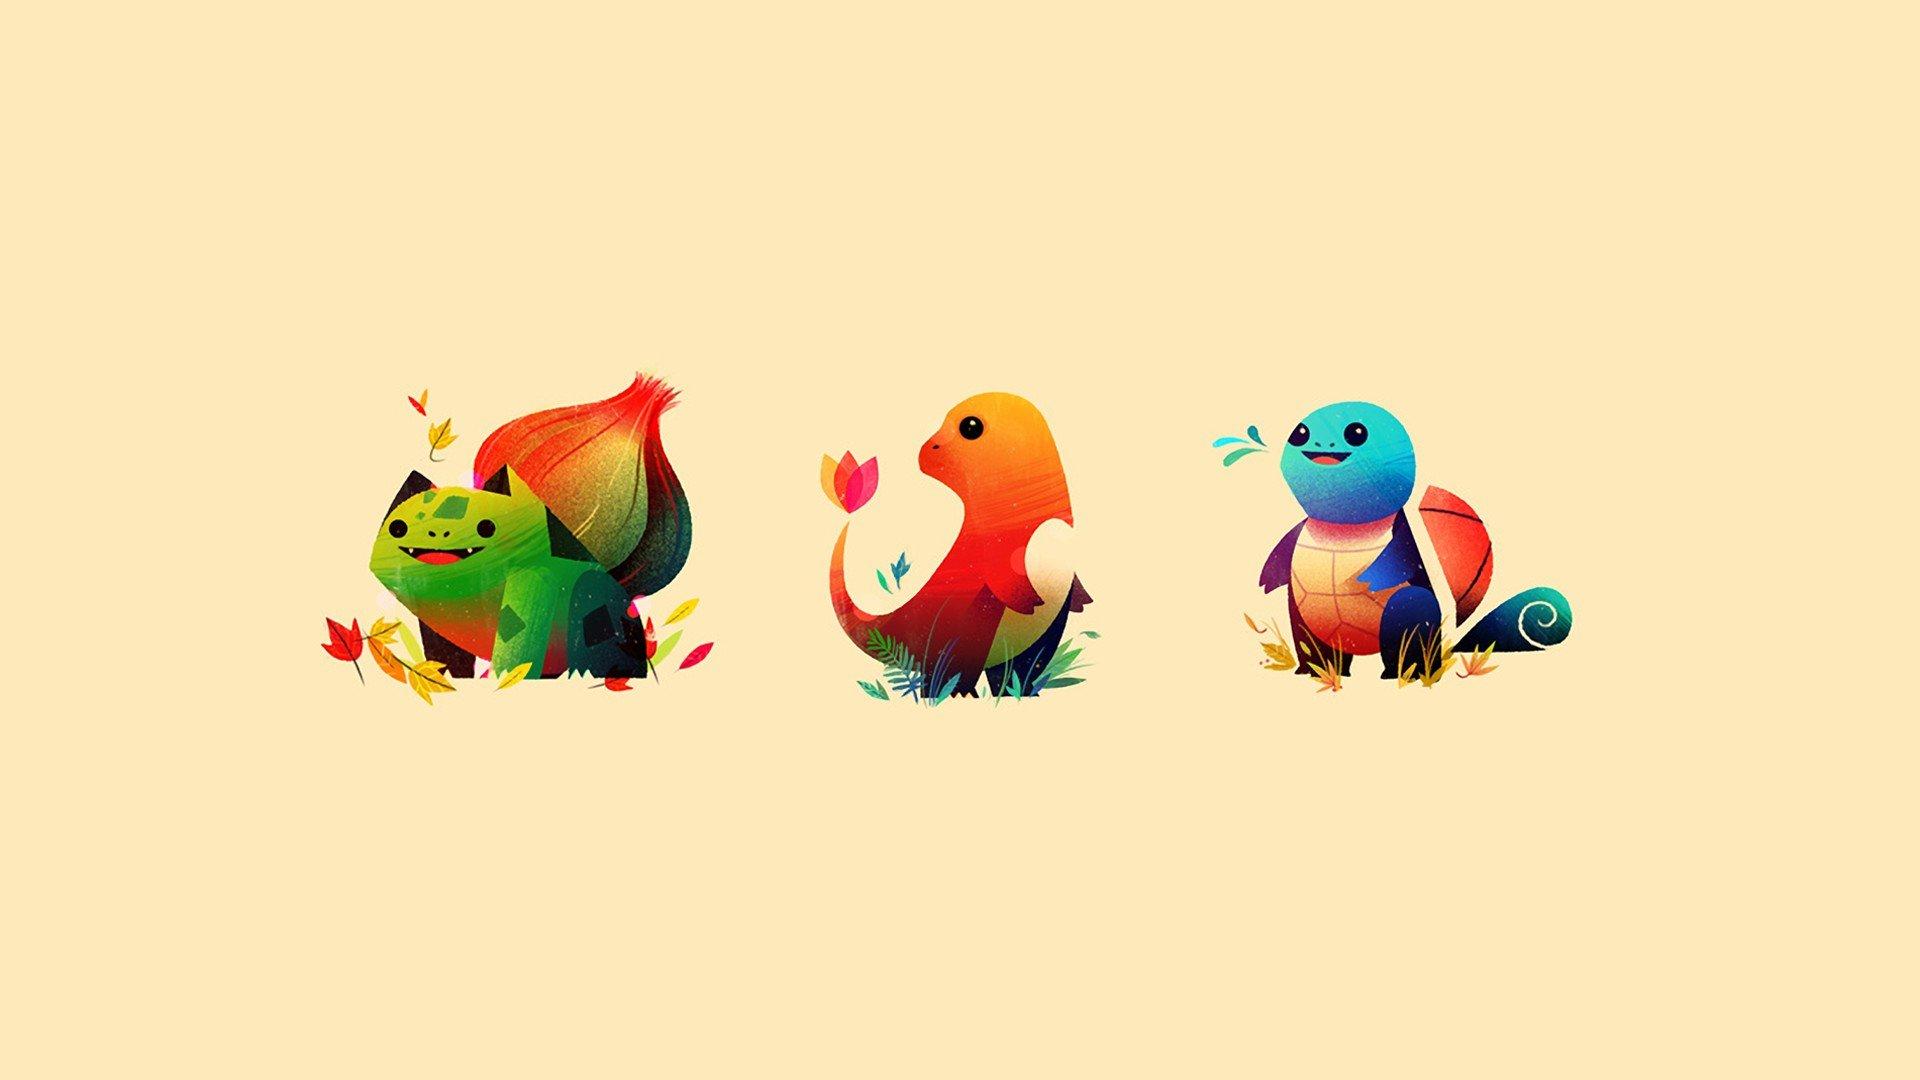 Cute Pig Wallpaper Hd Pokemon Minimalism Hd Wallpapers Desktop And Mobile